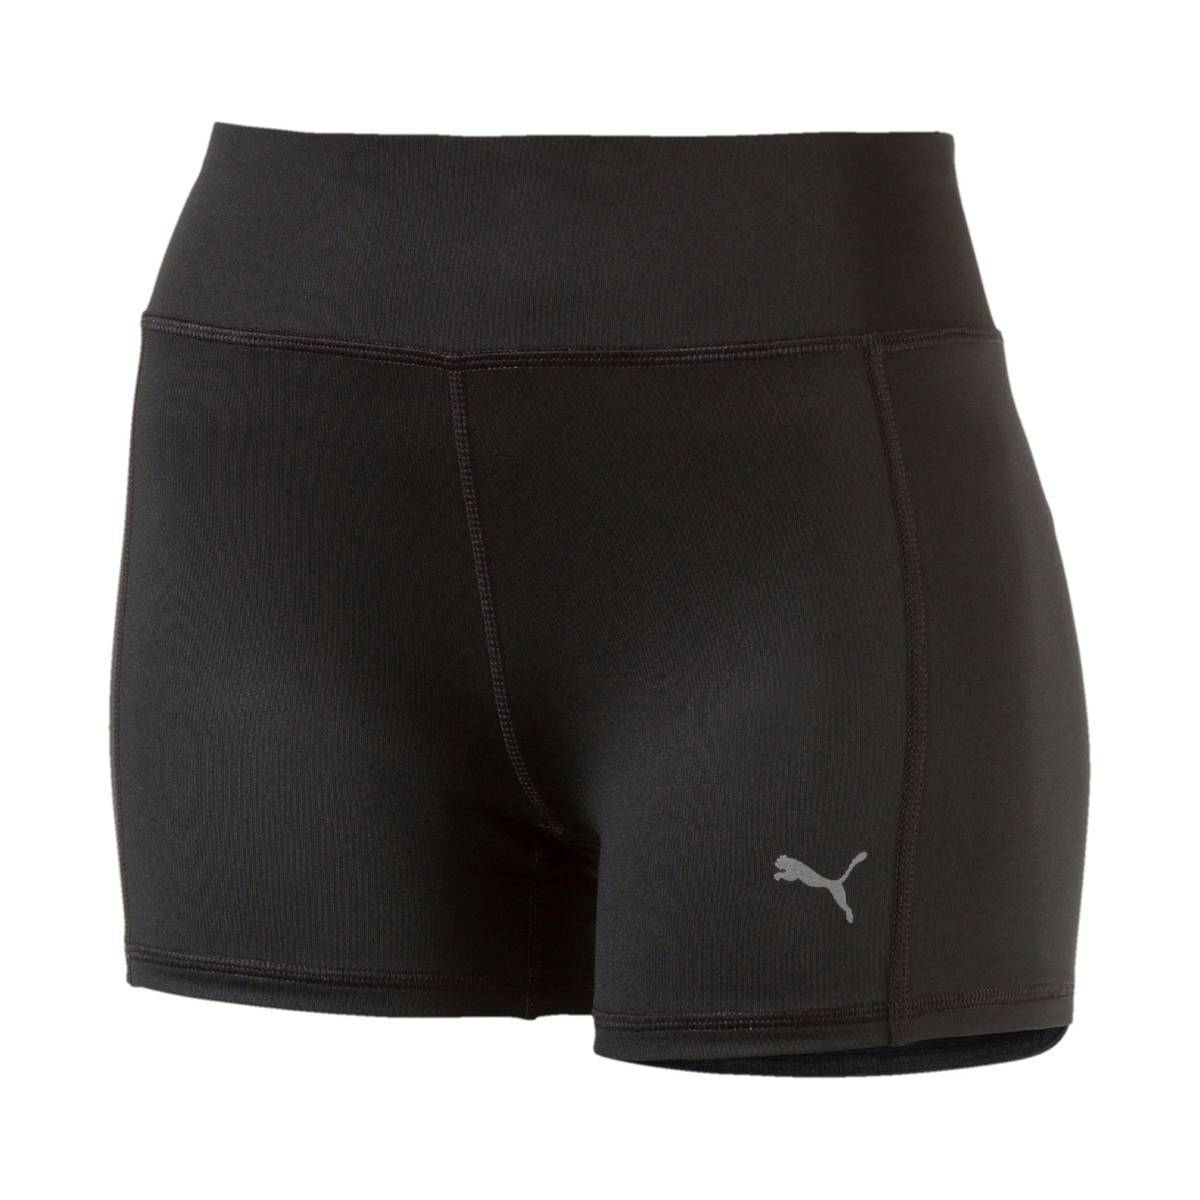 PUMA Short de sport cuissard Essential short tight